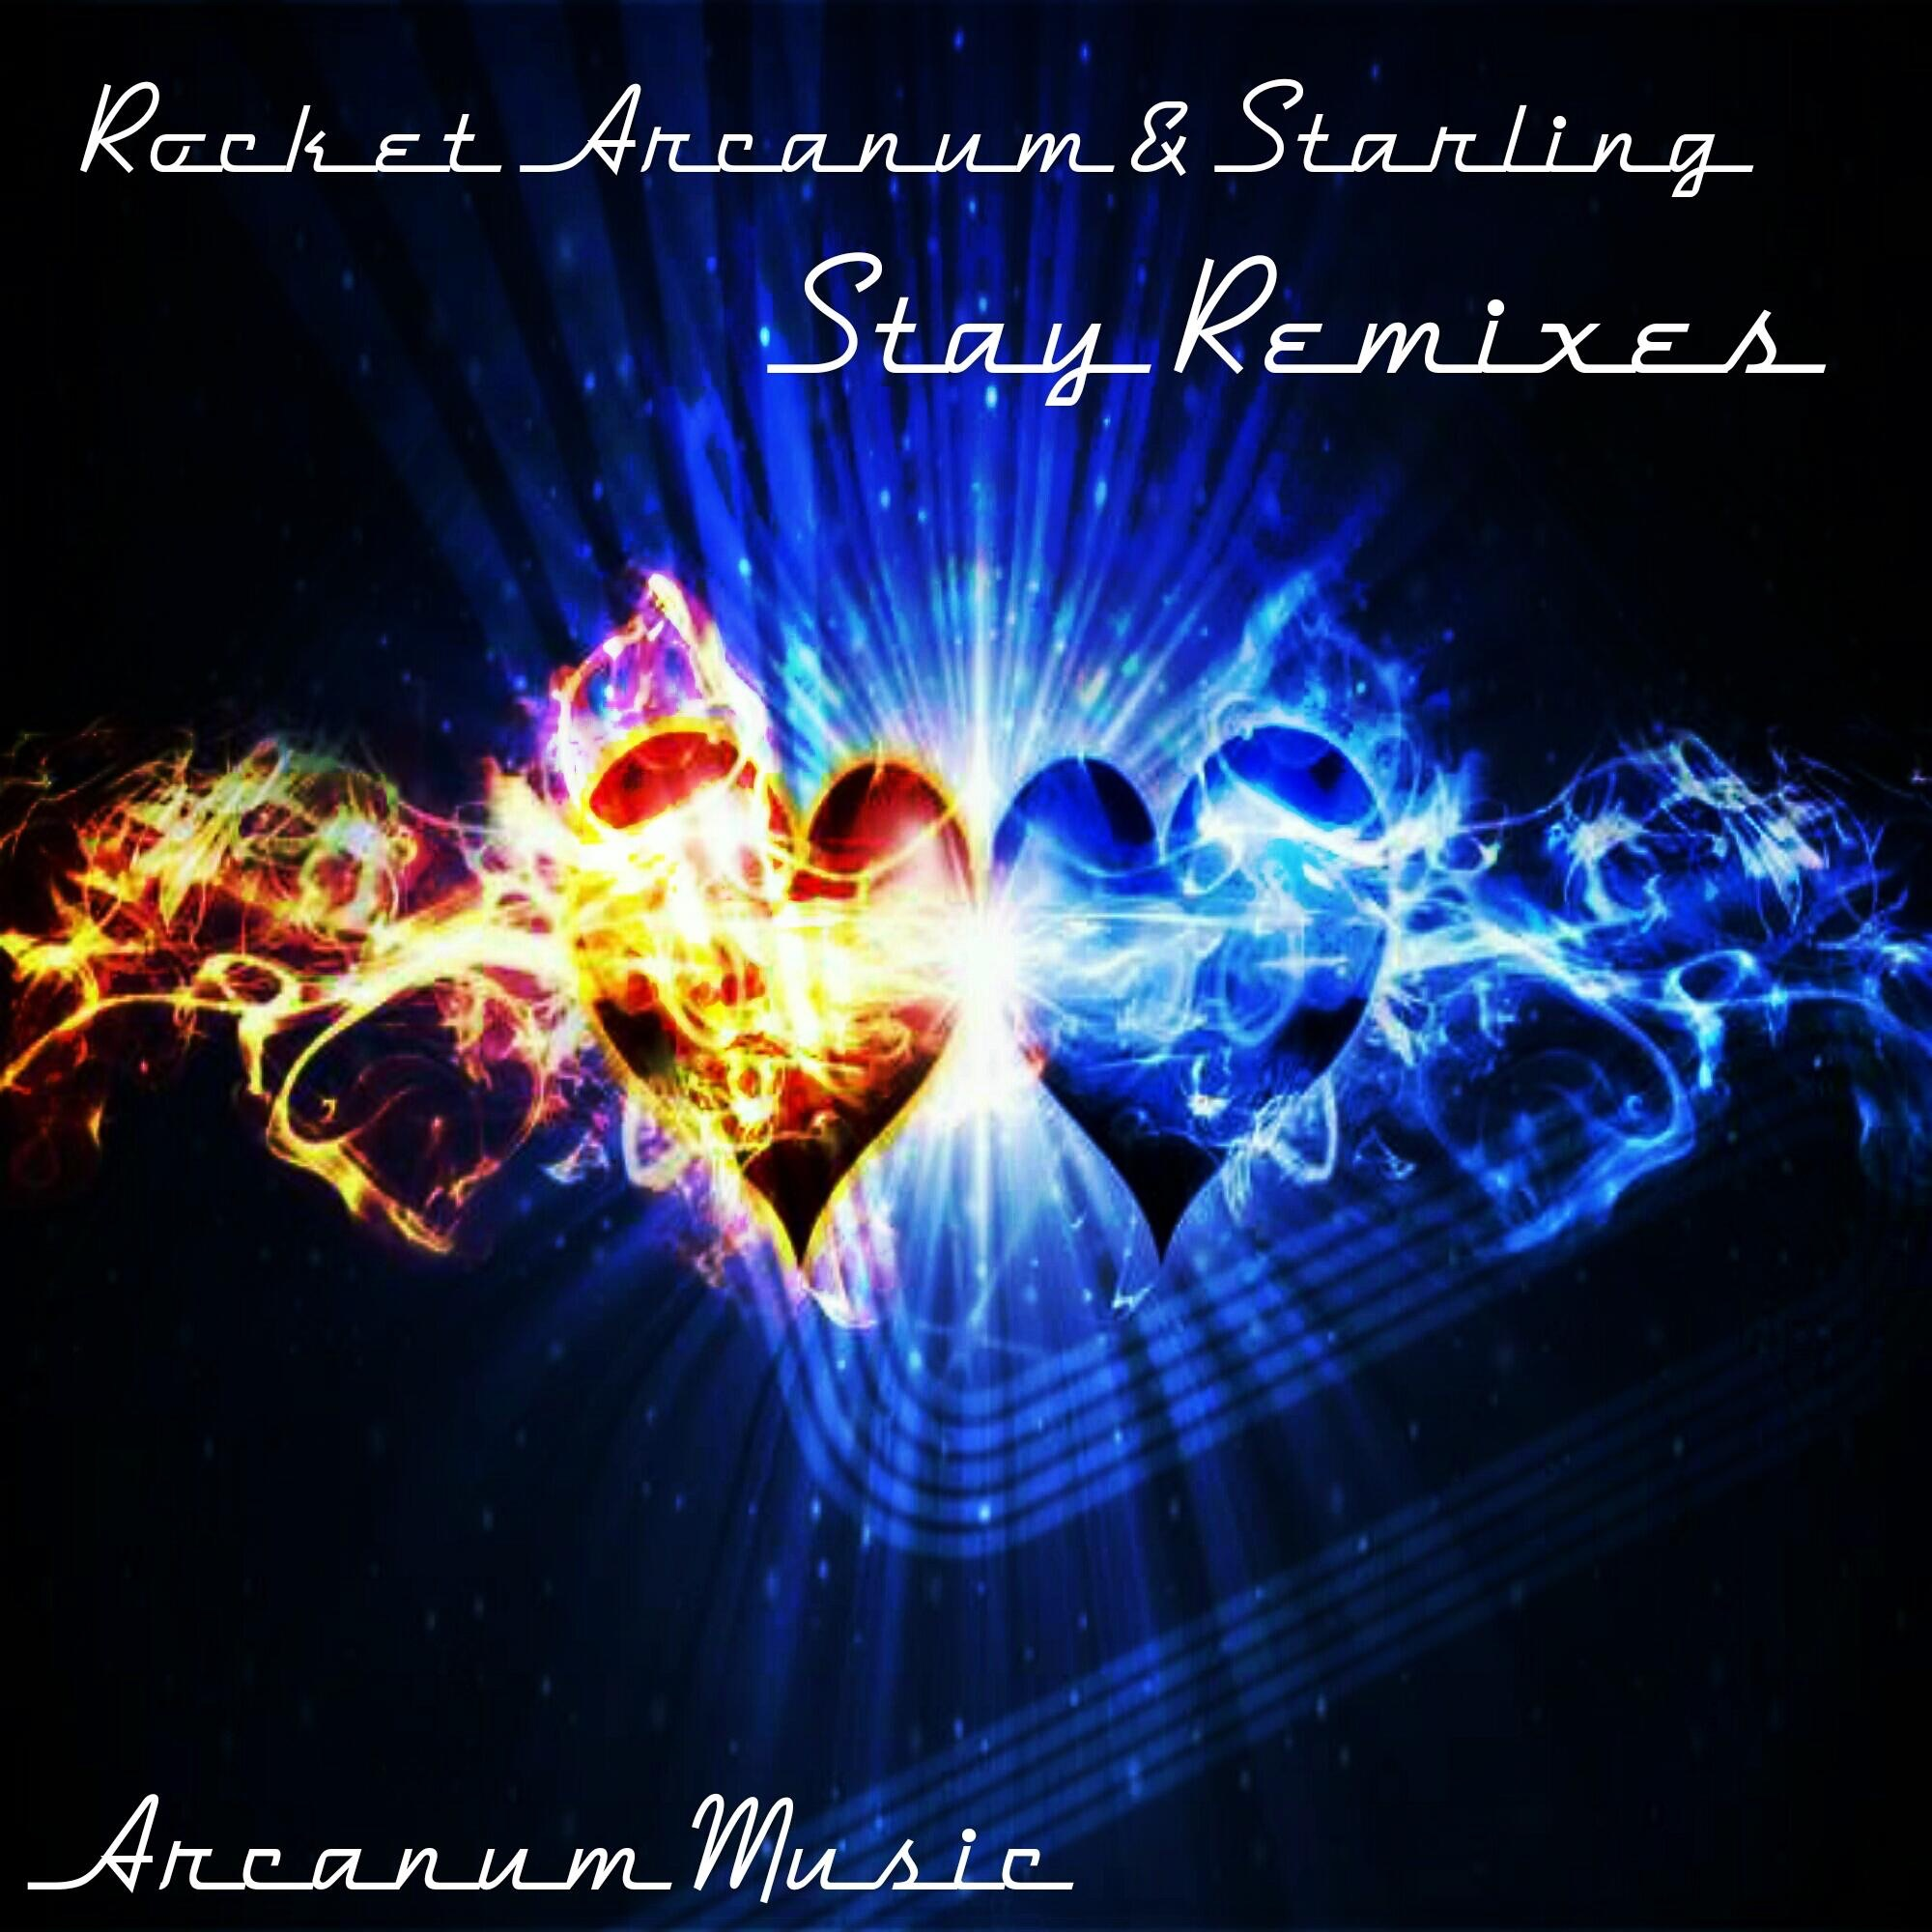 Stay Remixes - Single